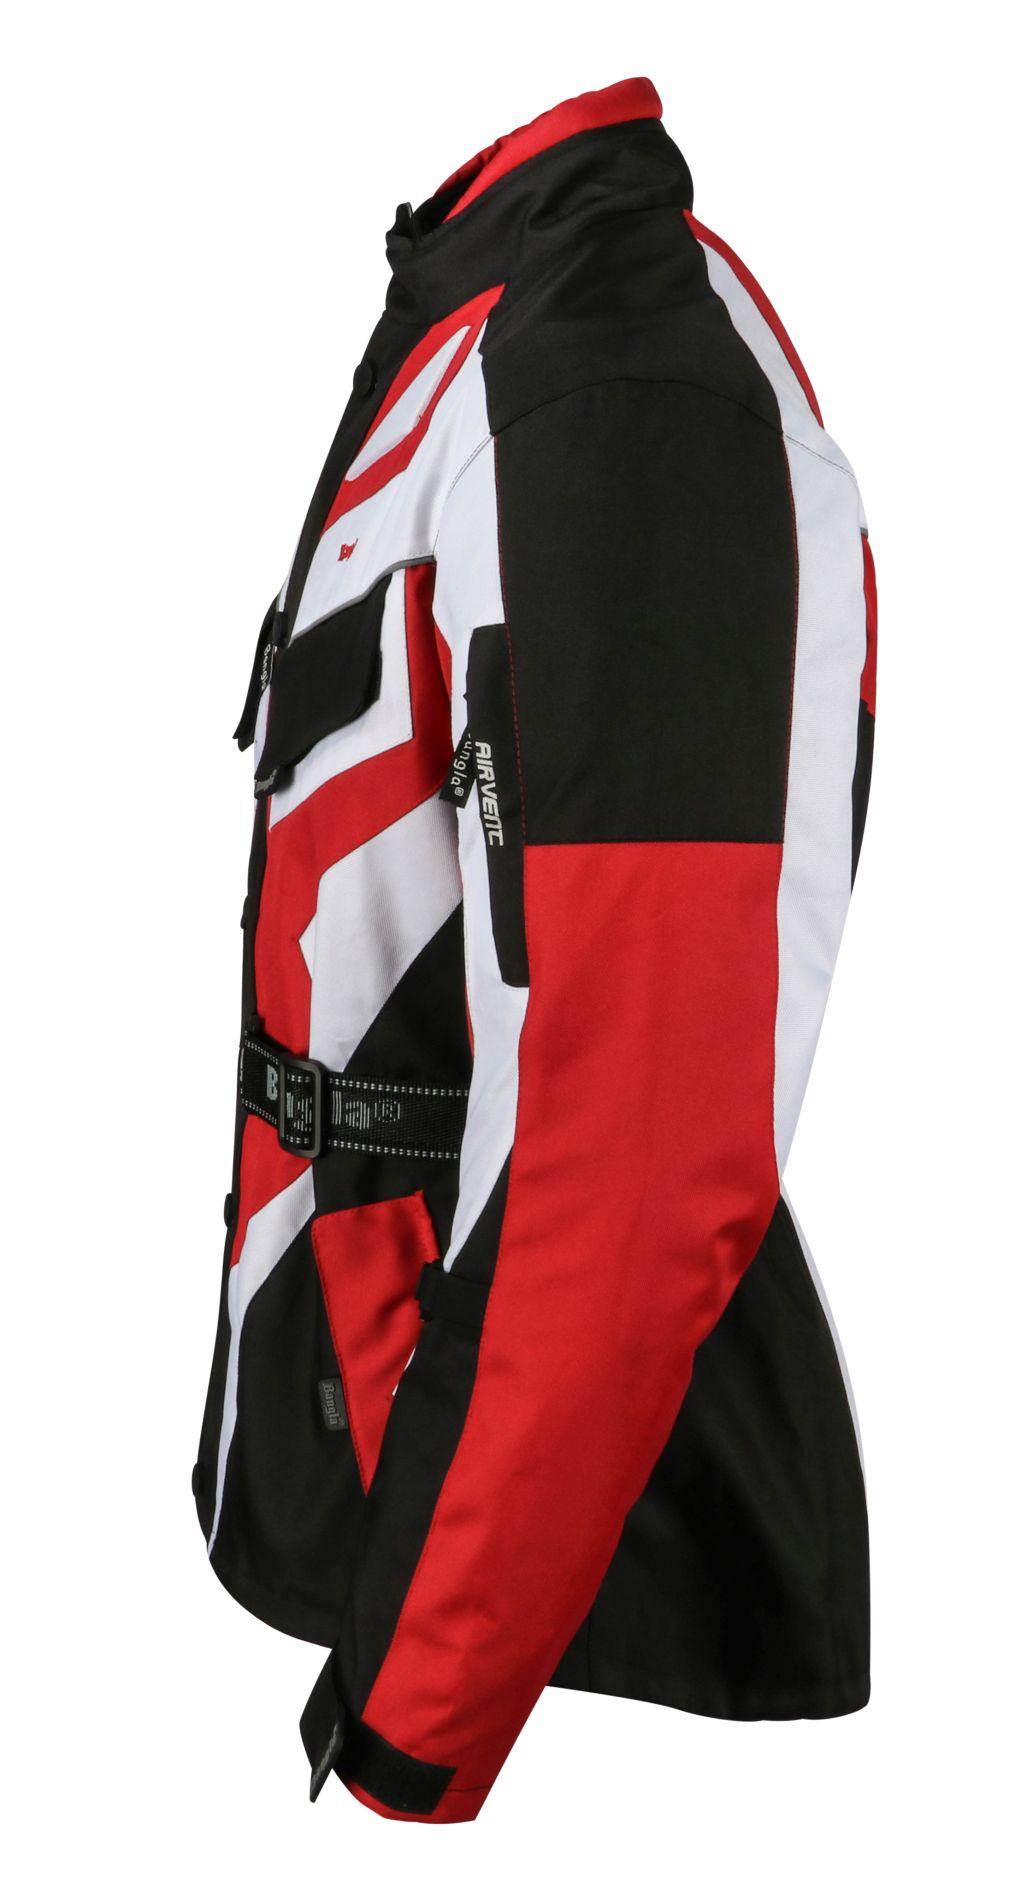 Bangla Motorrad Jacke Motorradjacke Textil Cordura rot schwarz weiss S - 6 XL